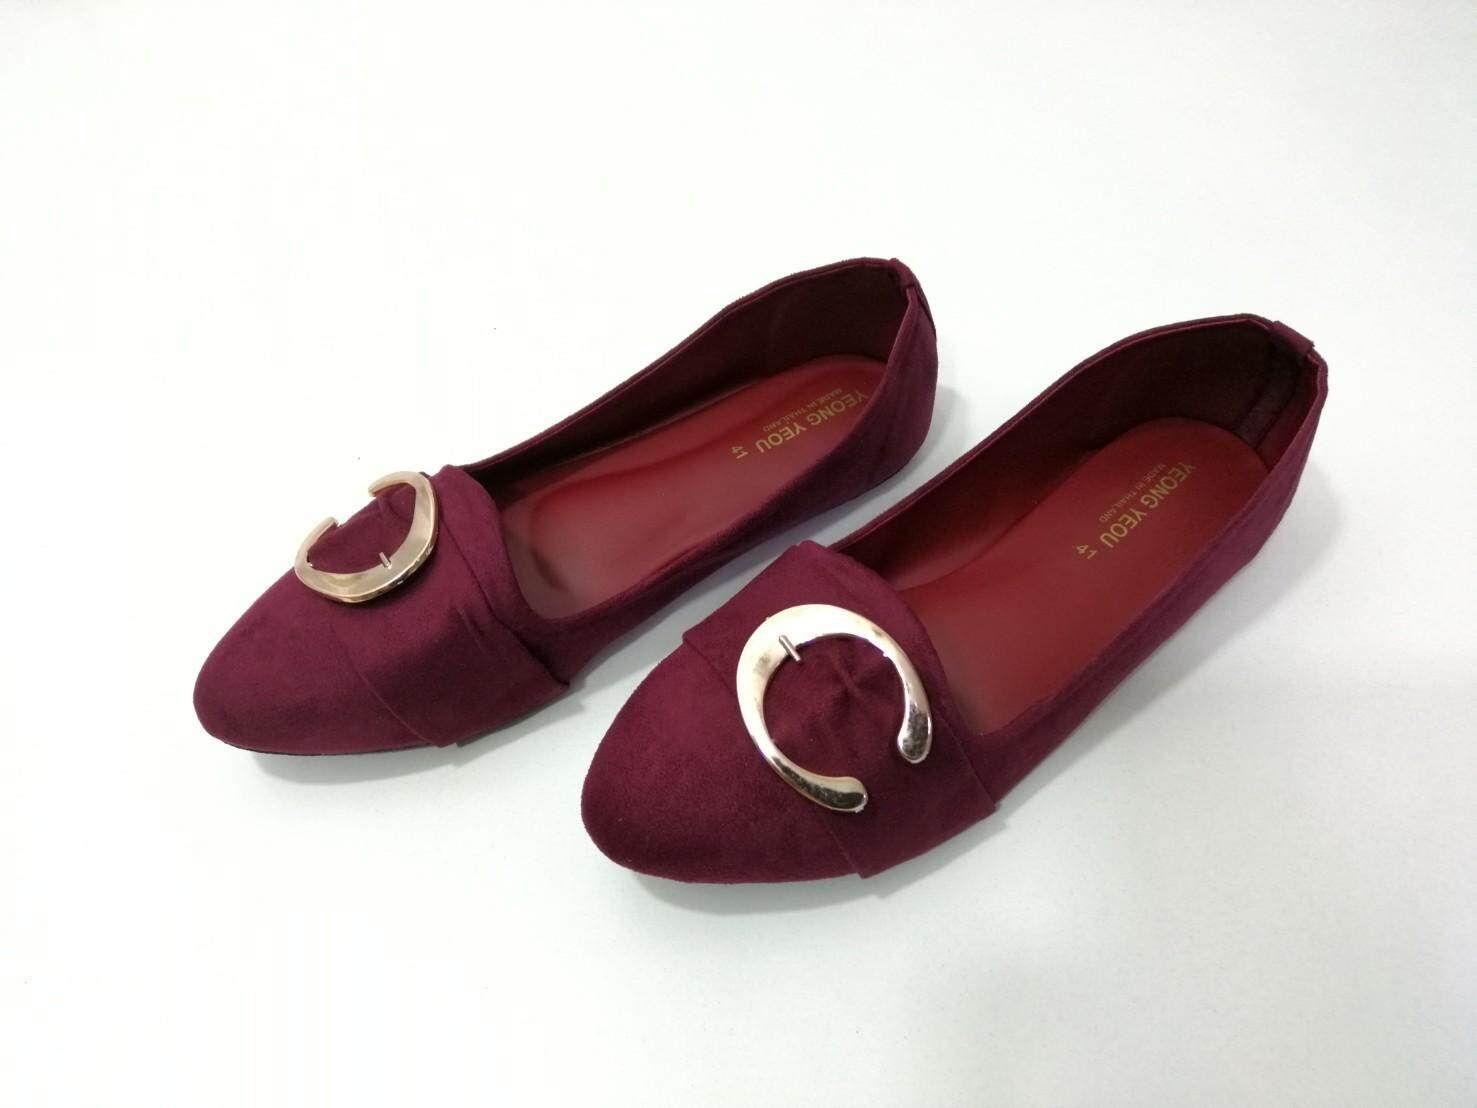 Yeong Yeou รองเท้าคัทชูผ้าหนังกลับตัว C บิ๊กไซส์ Yy626-1.